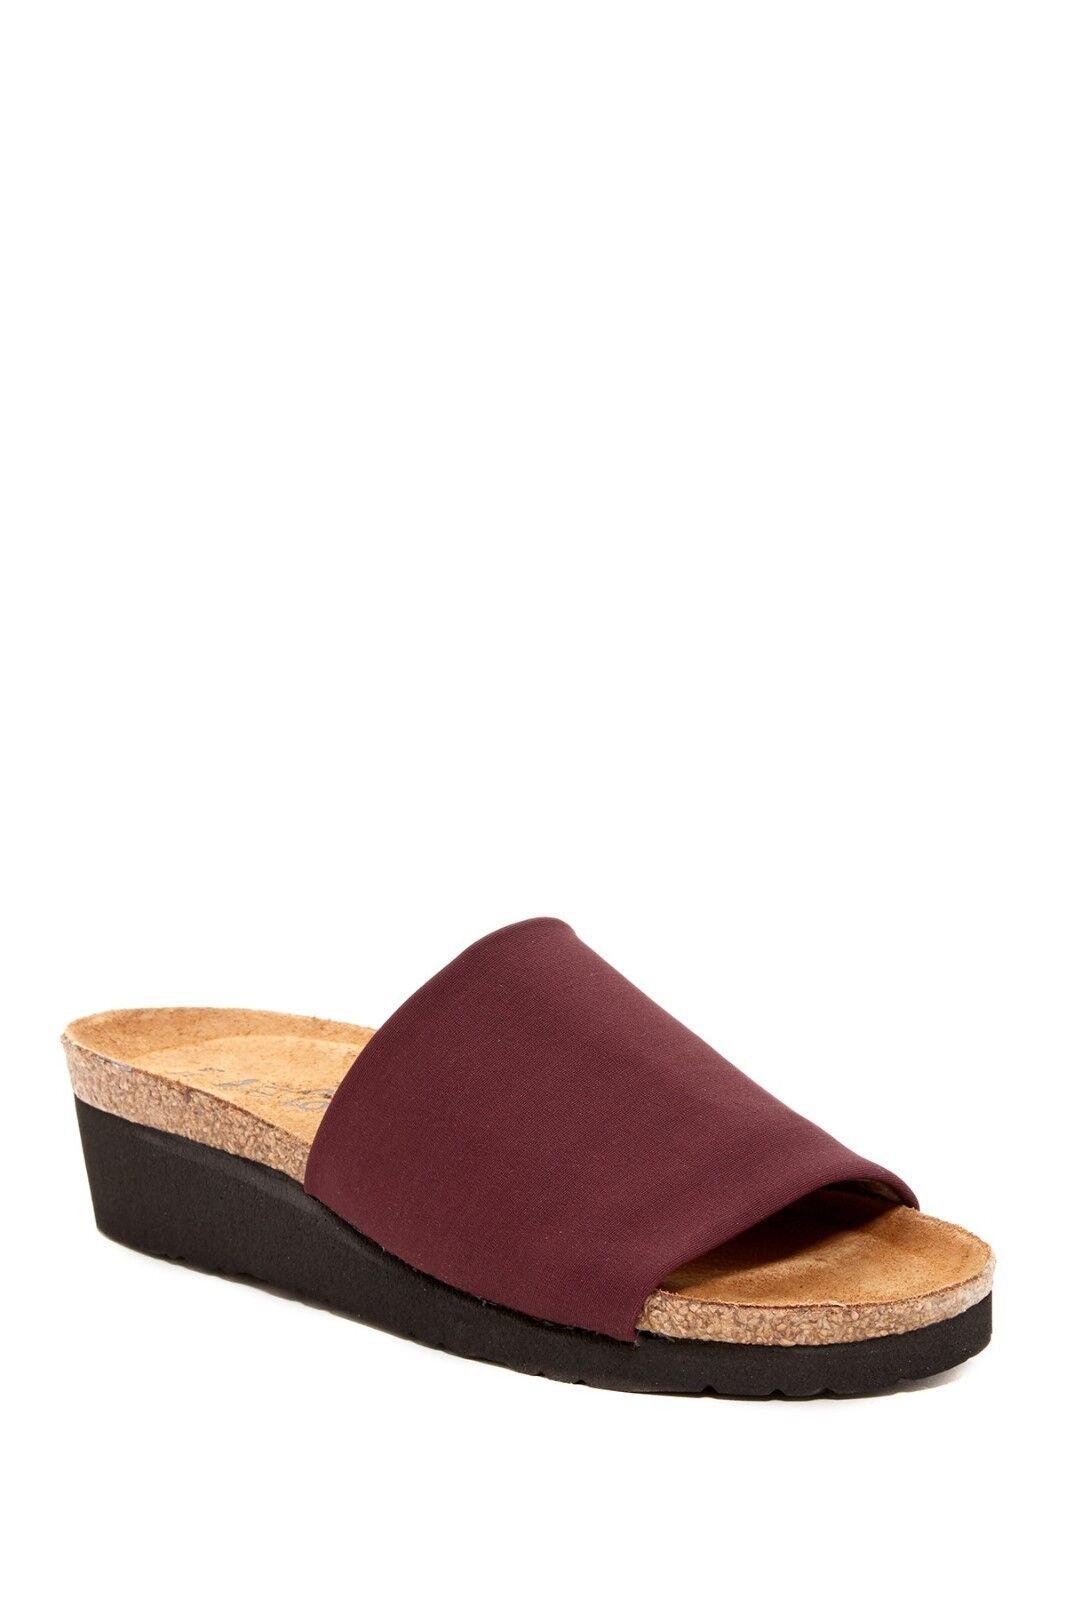 Naot ALANA Slide Sandal NIB SlipOn Mule ORTHOTIC STRETCH Wedge PLUM STRETCH ORTHOTIC 37 ~ 41~ 42 cbc6f8